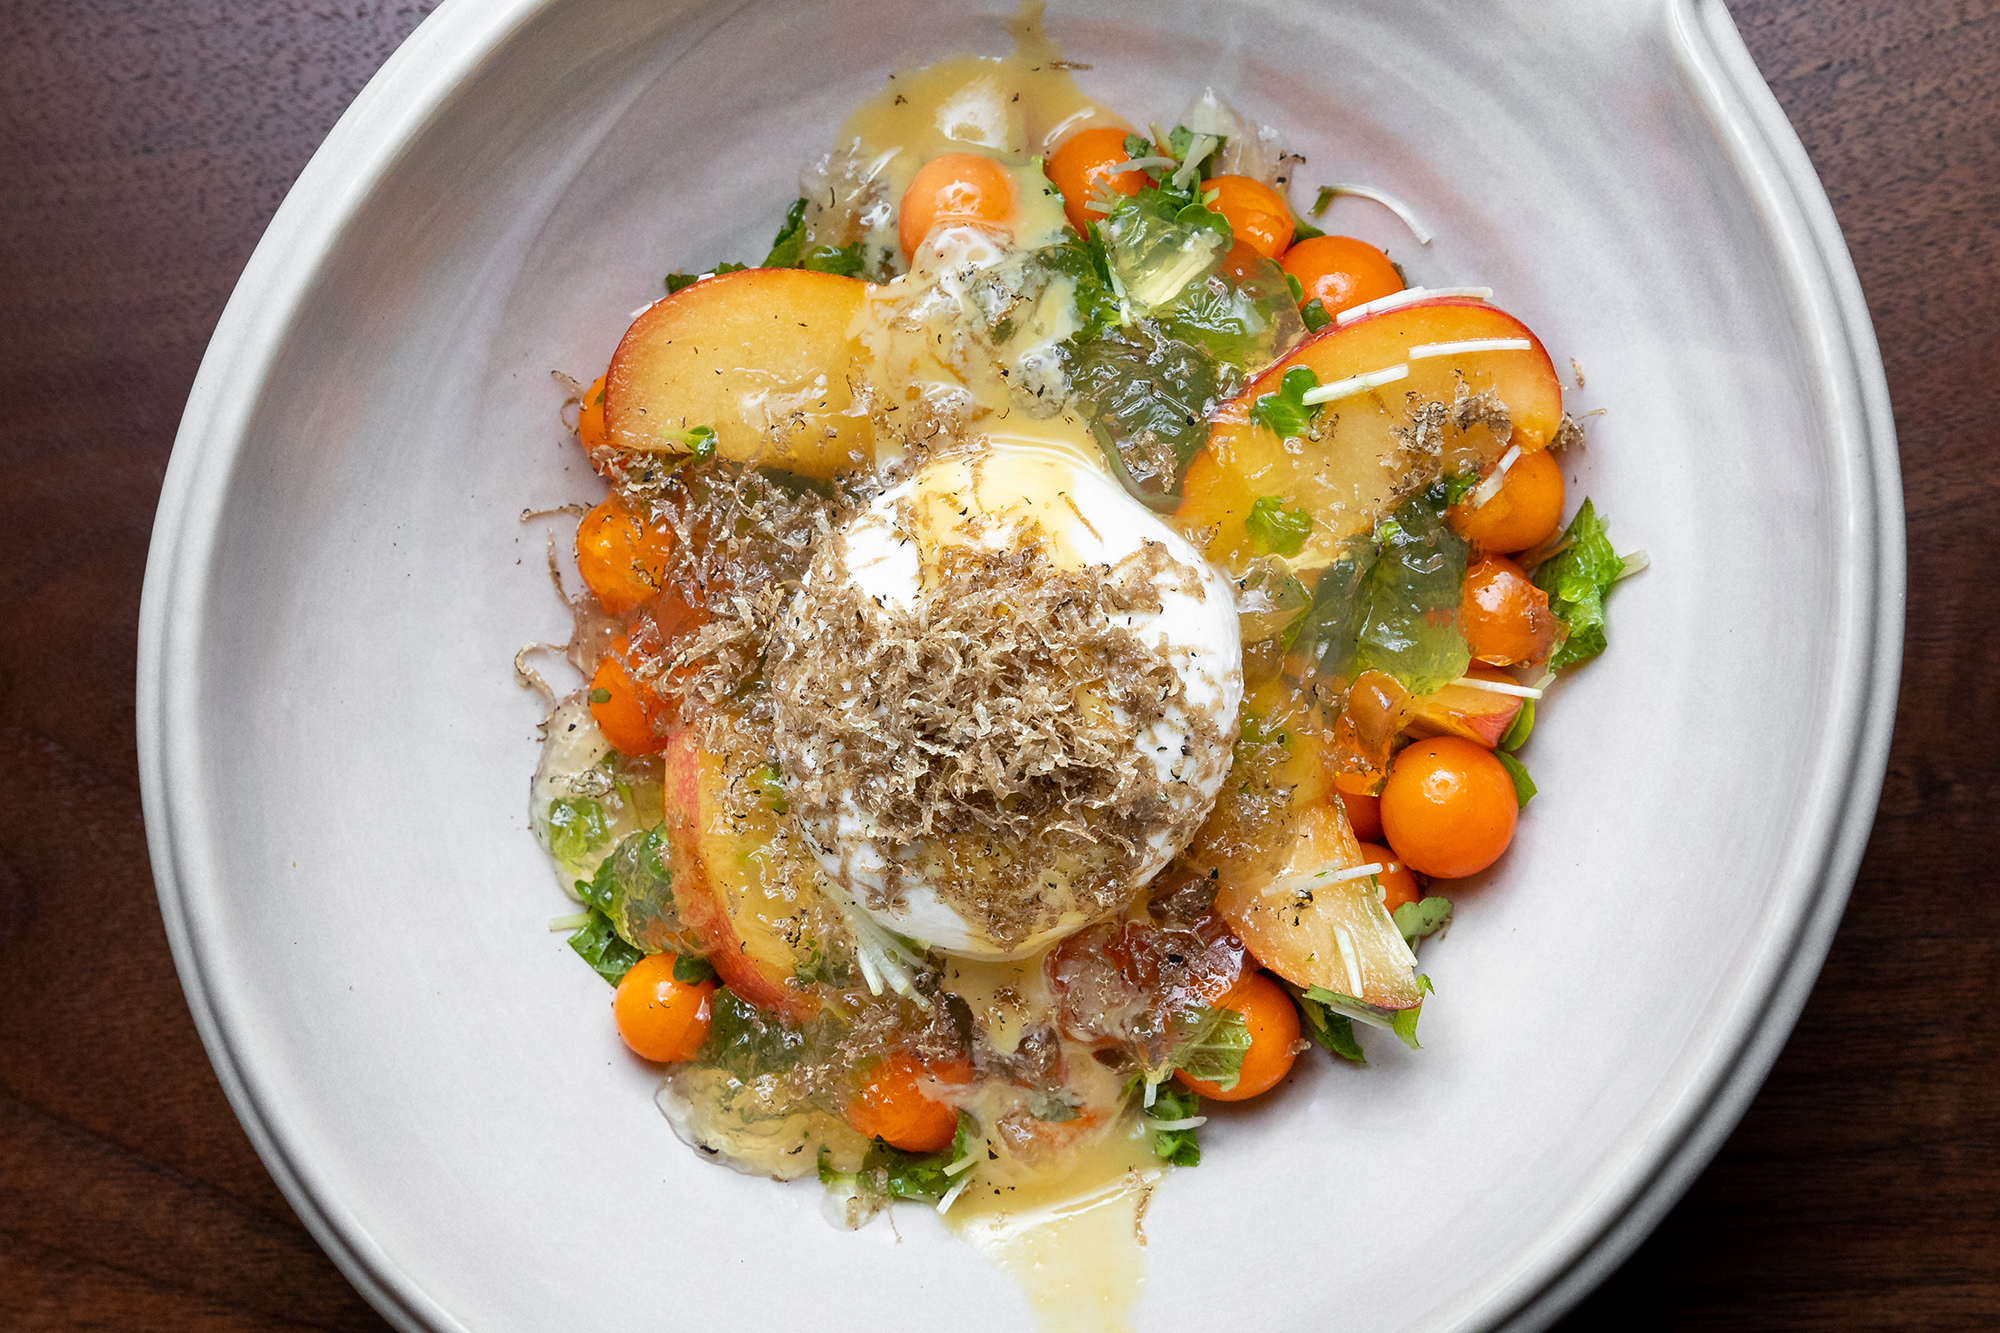 Truffled tomato and burrata at Chateau Hanare Japanese restaurant at Chateau Marmont